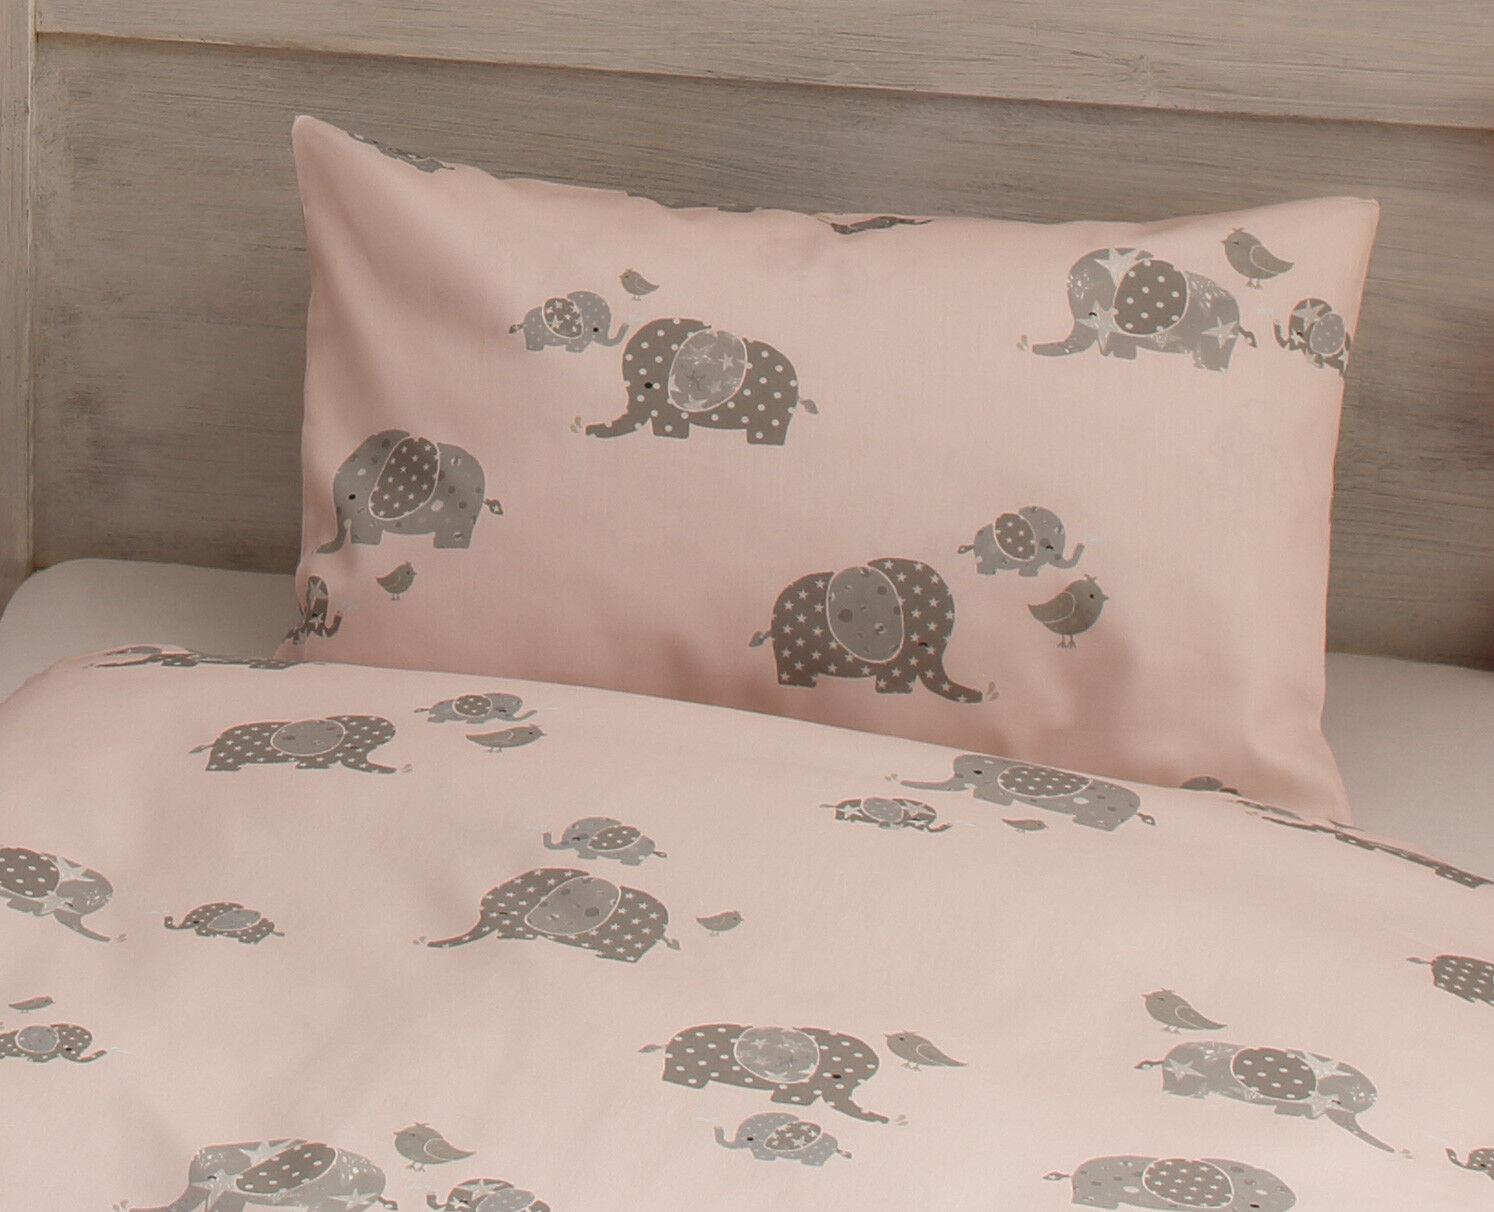 Mako Satin Kinder Bettwäsche Elefanten Elefanten Elefanten in Rosa, grau oder grün 100% Baumwolle | Online-Exportgeschäft  dea569